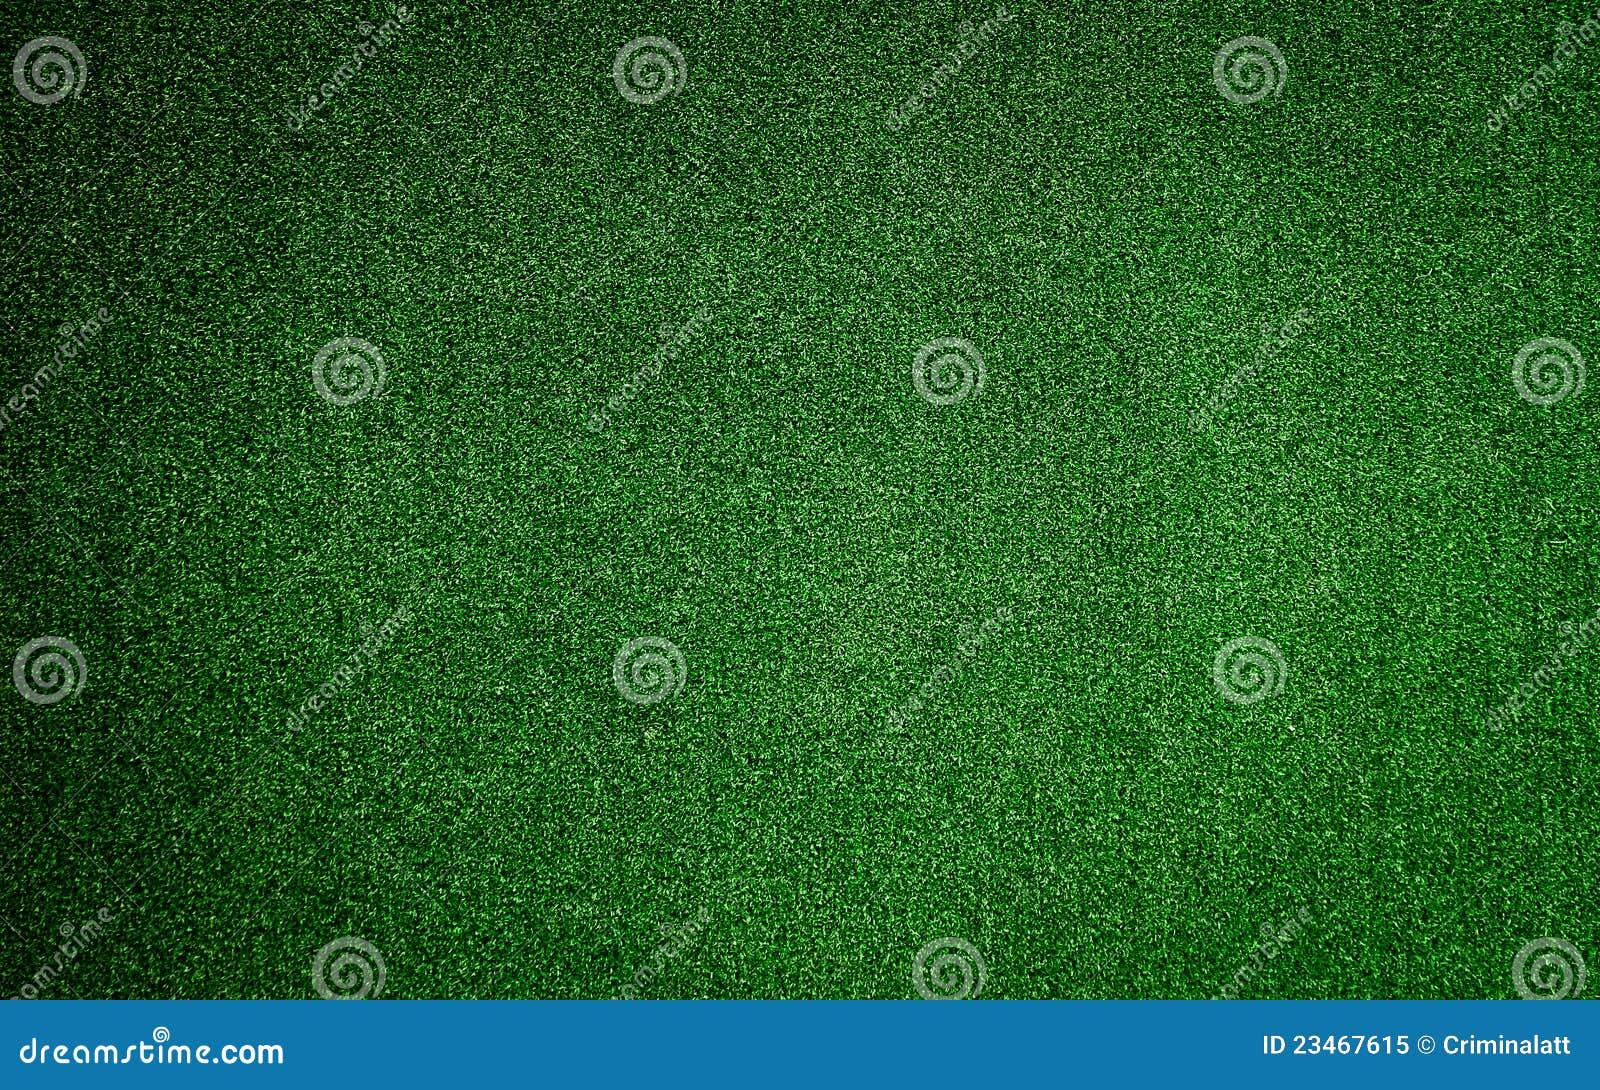 texture fausse d 39 herbe image stock image du vert nature 23467615. Black Bedroom Furniture Sets. Home Design Ideas